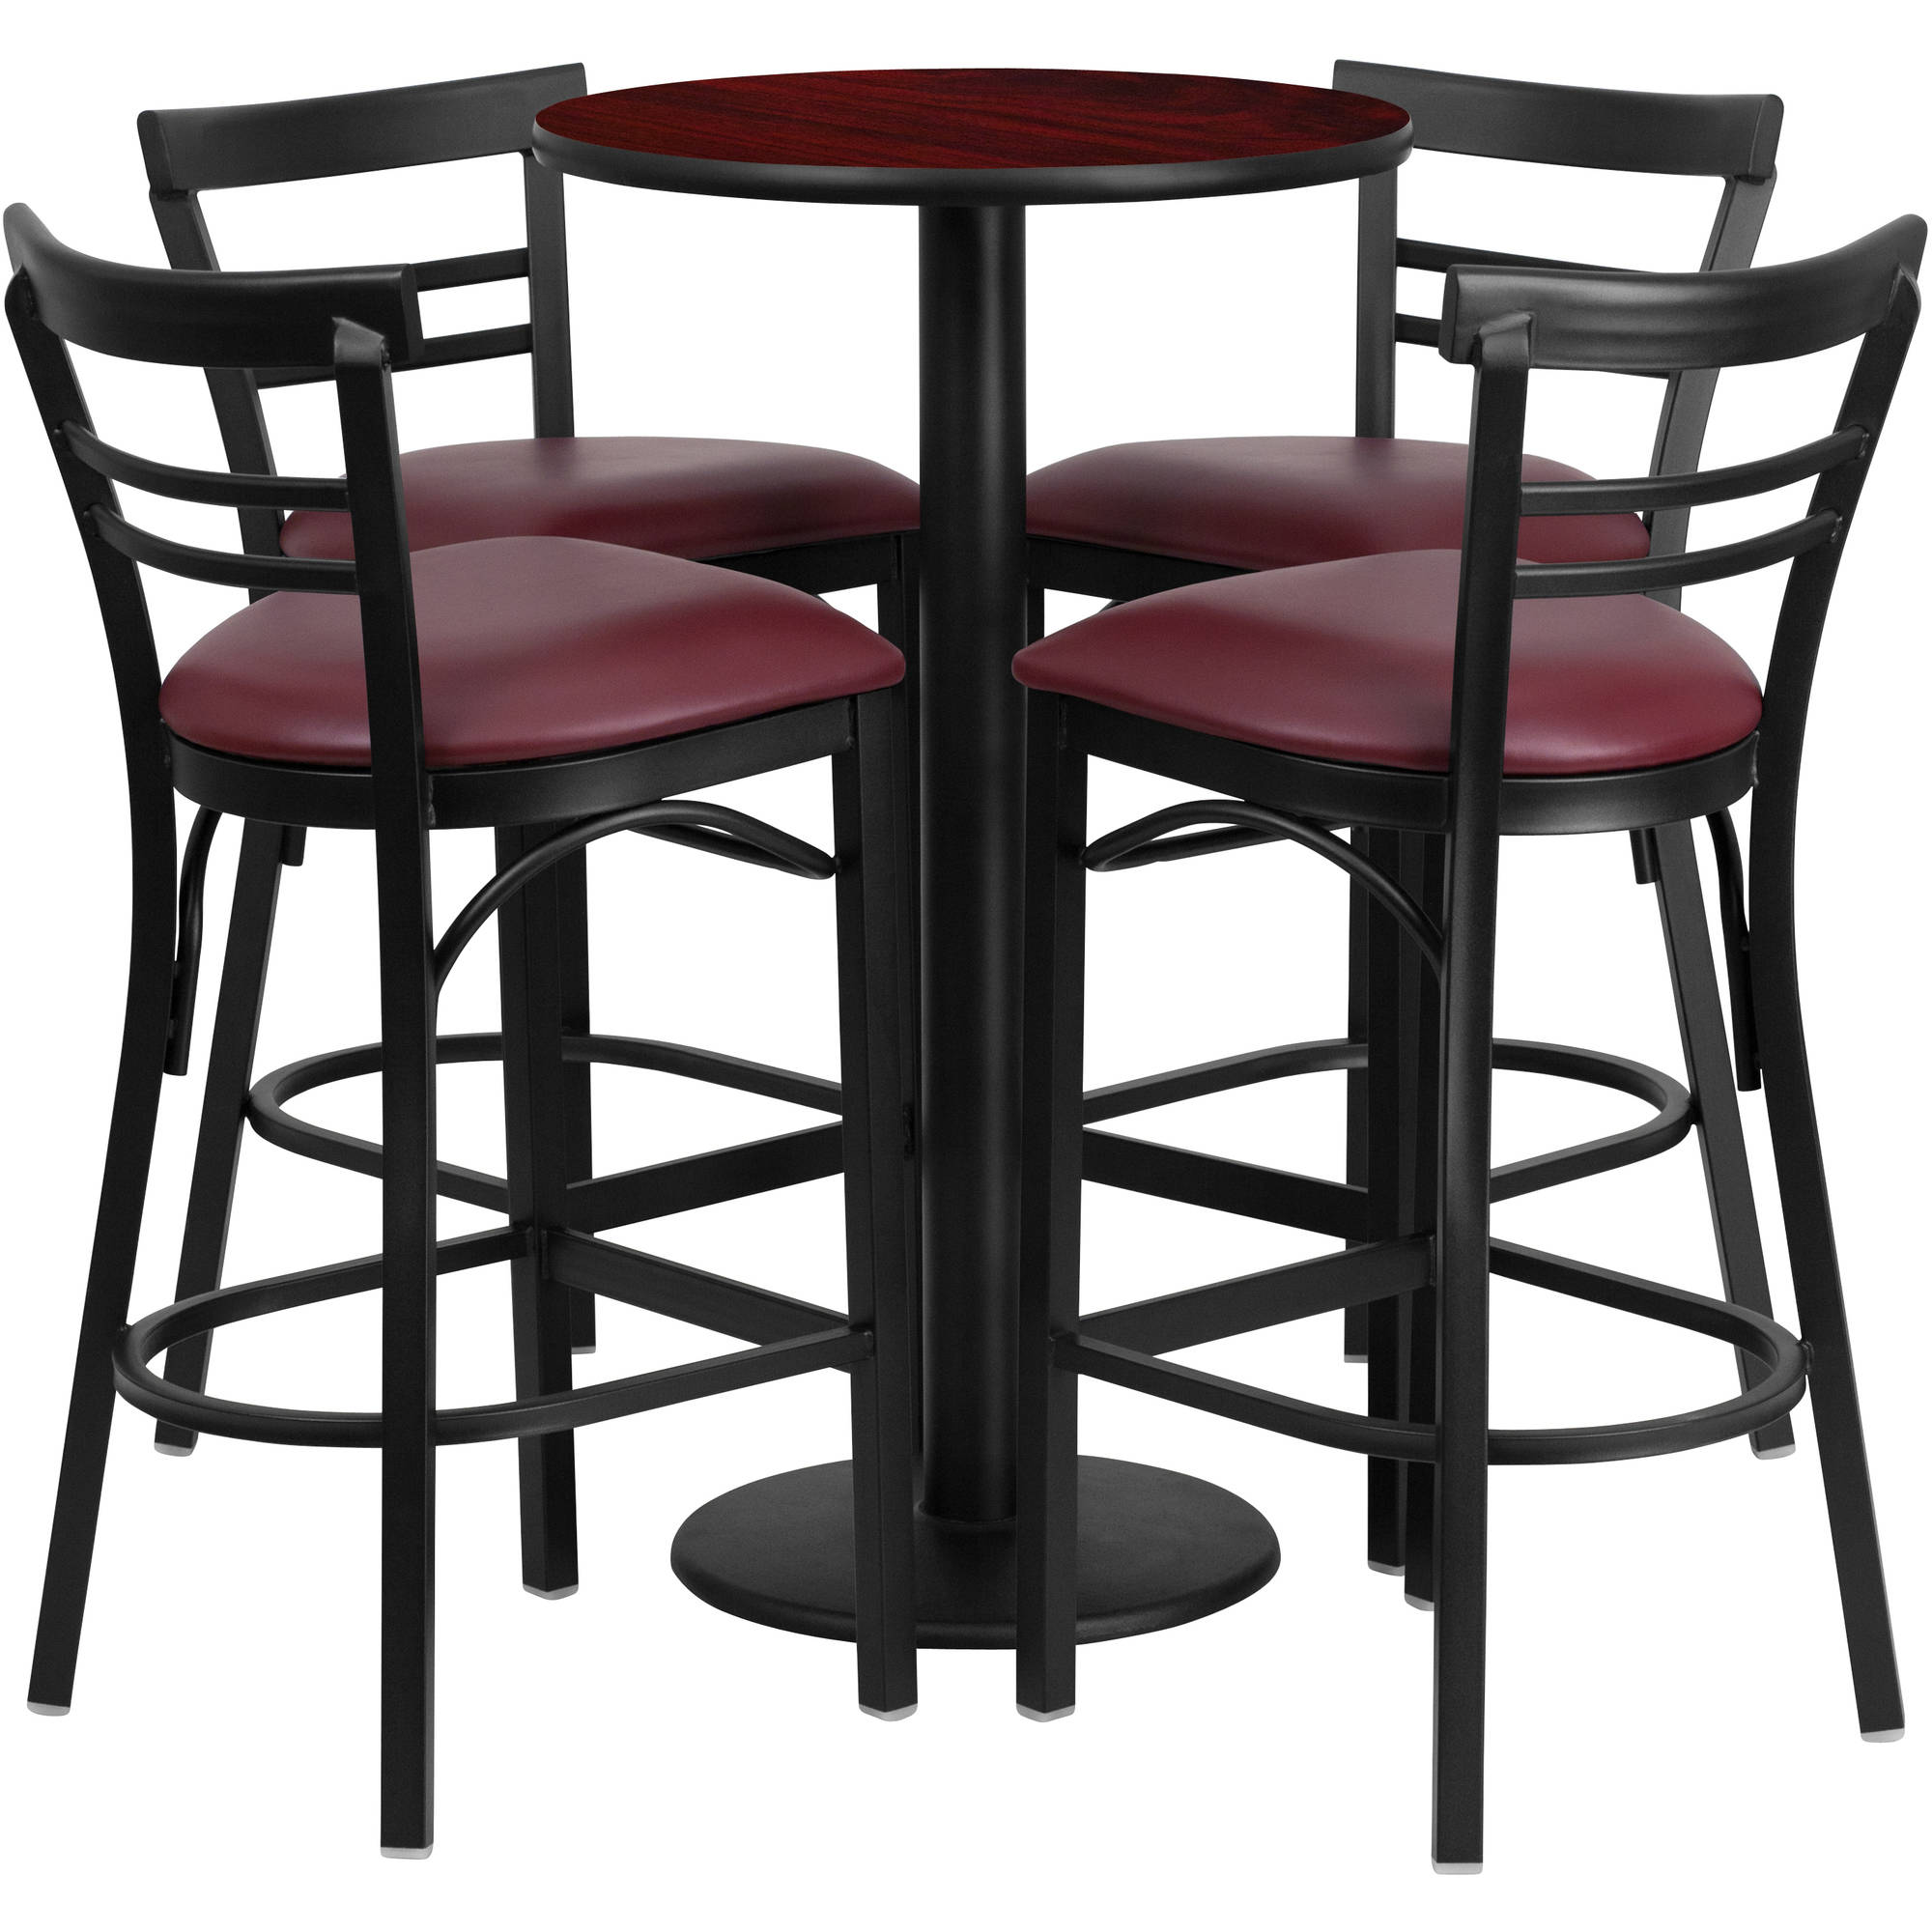 Flash Furniture 24'' Round Mahogany Laminate Table Set with 4 Ladder Back Metal Barstools, Burgundy Vinyl Seat